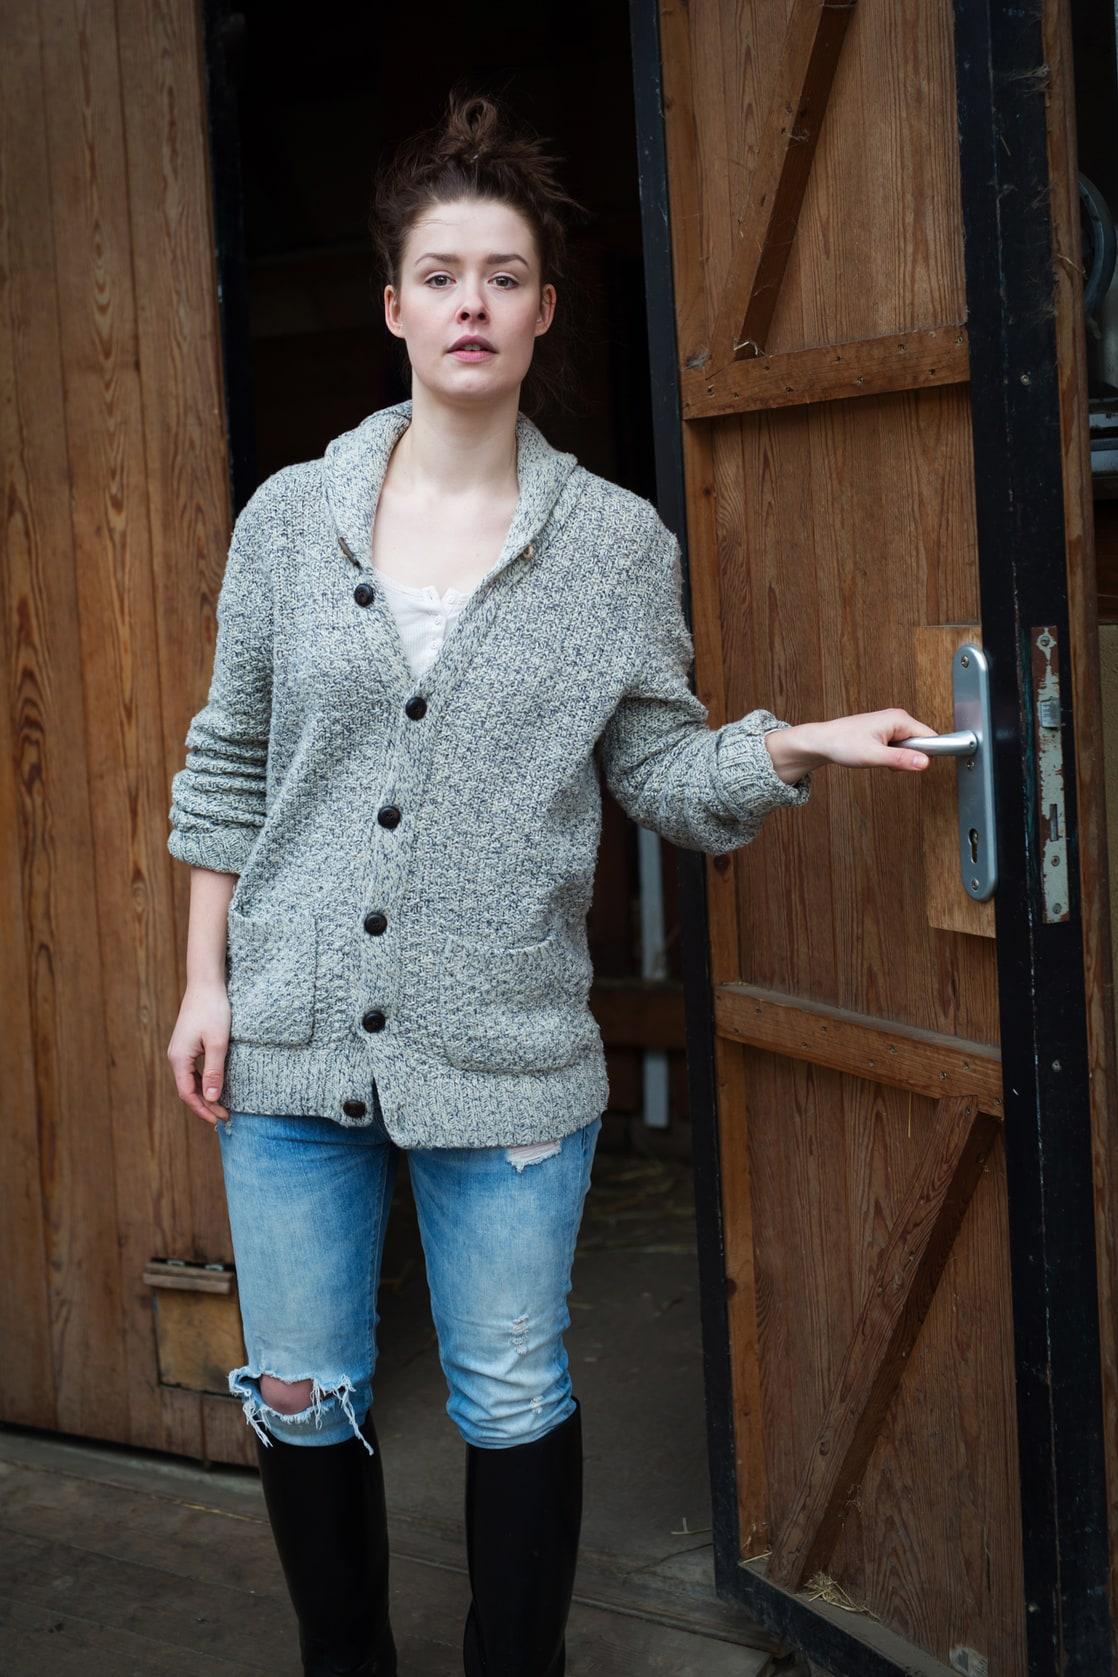 Emejing Laura Louisa Garde Nackt Images - Erstaunliche Ideen ...